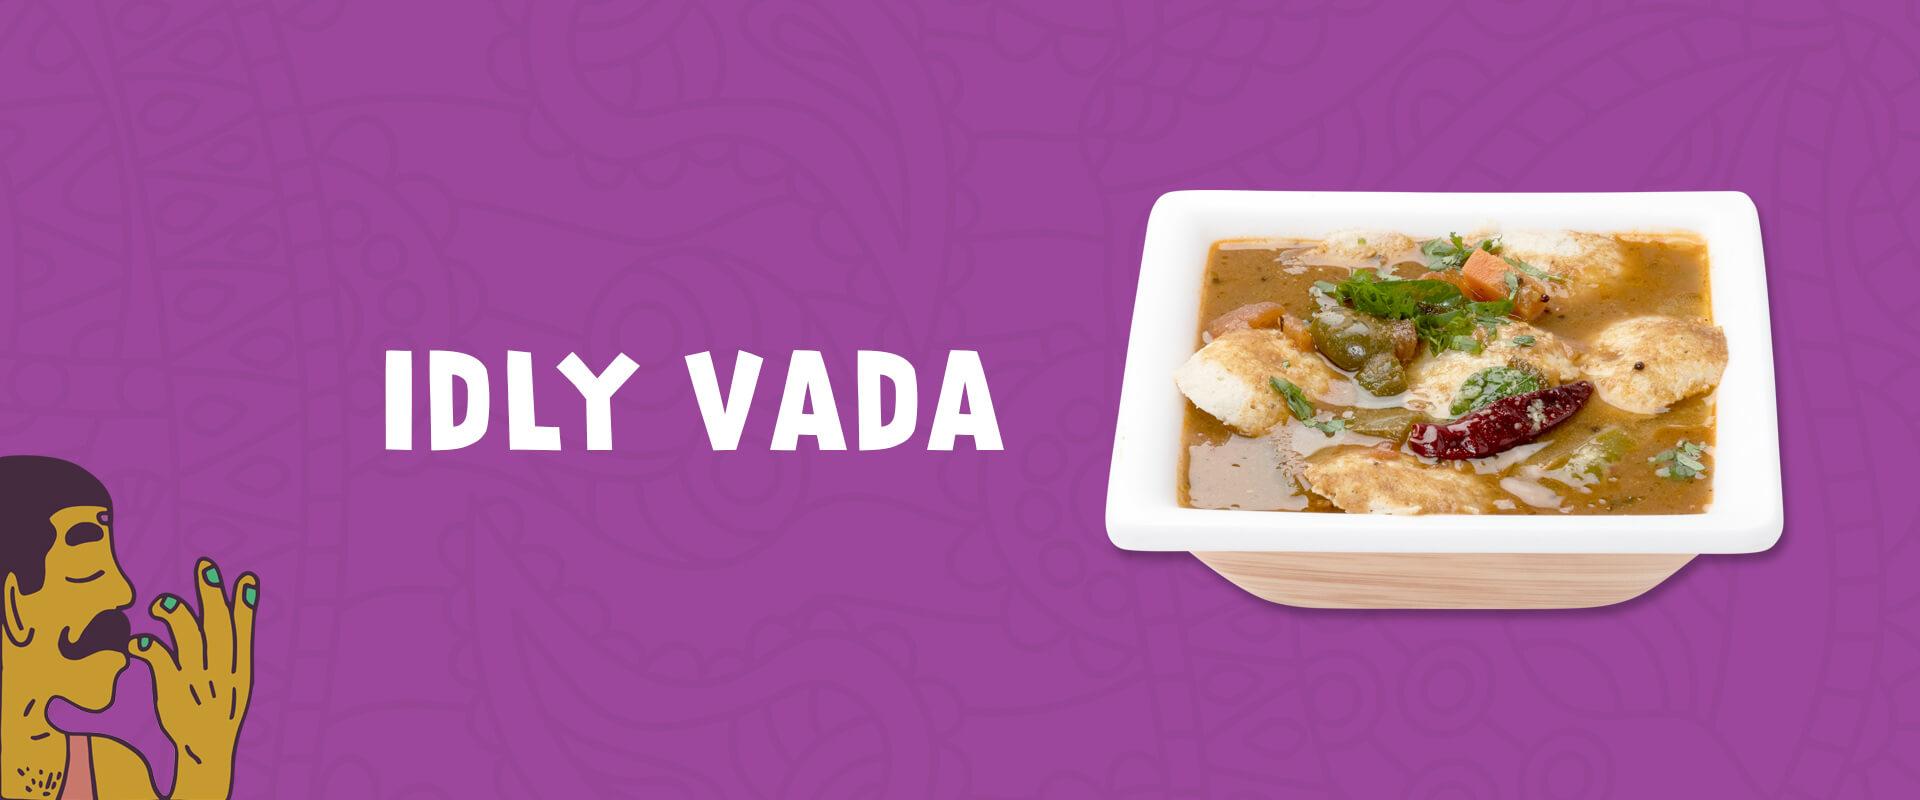 Classic idly vada sambhar with chutney